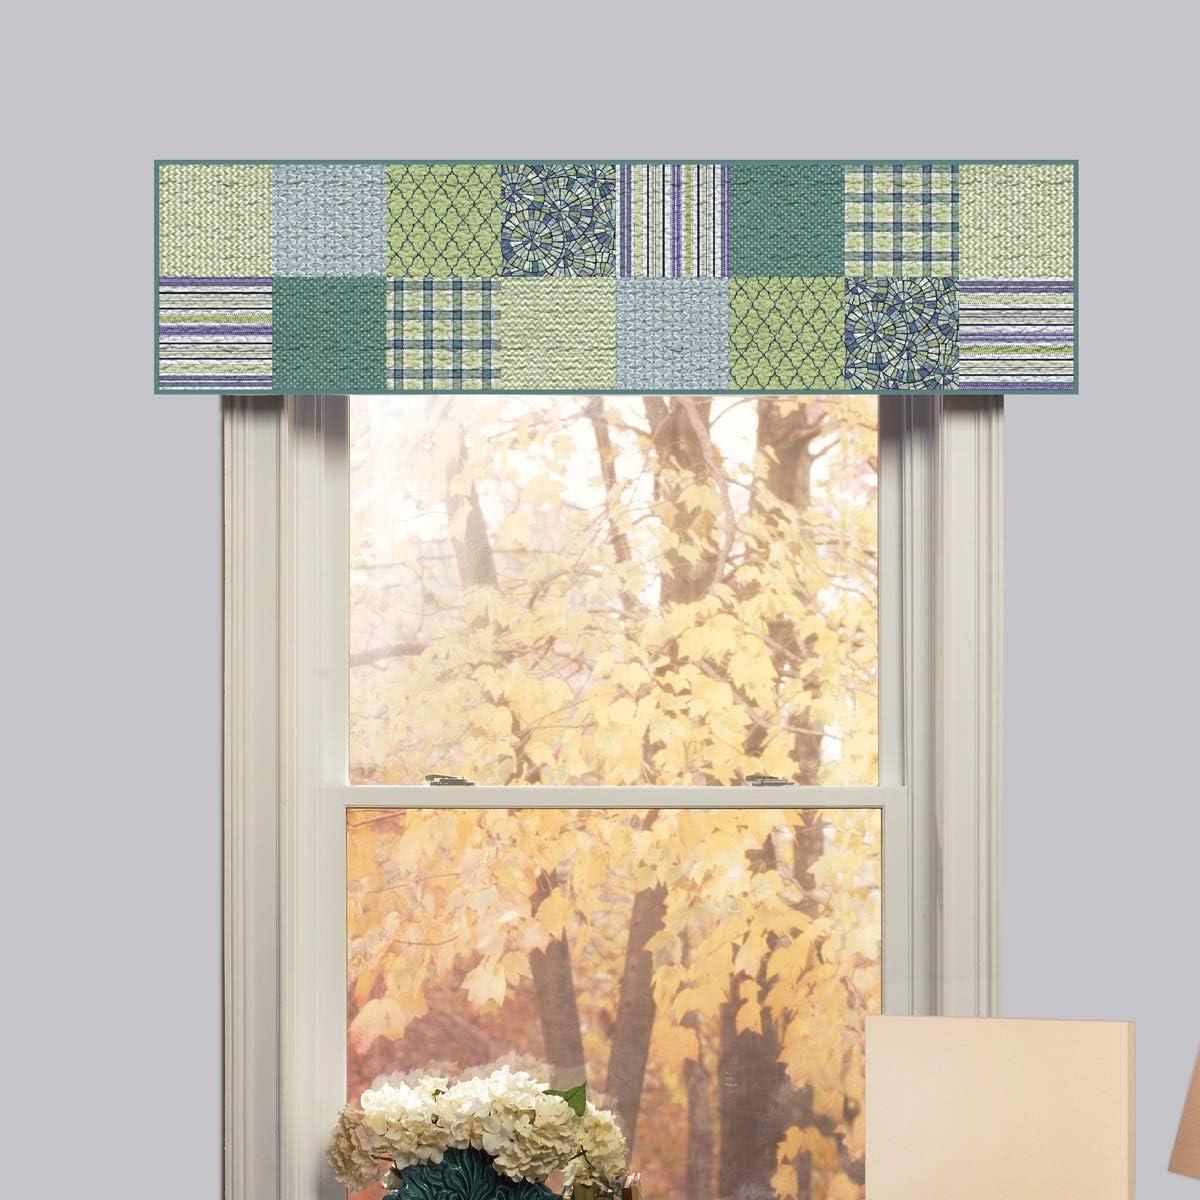 Donna Sharp Valance – Riptide Patch Coastal Decorative Window Treatment with Multicolored Pattern